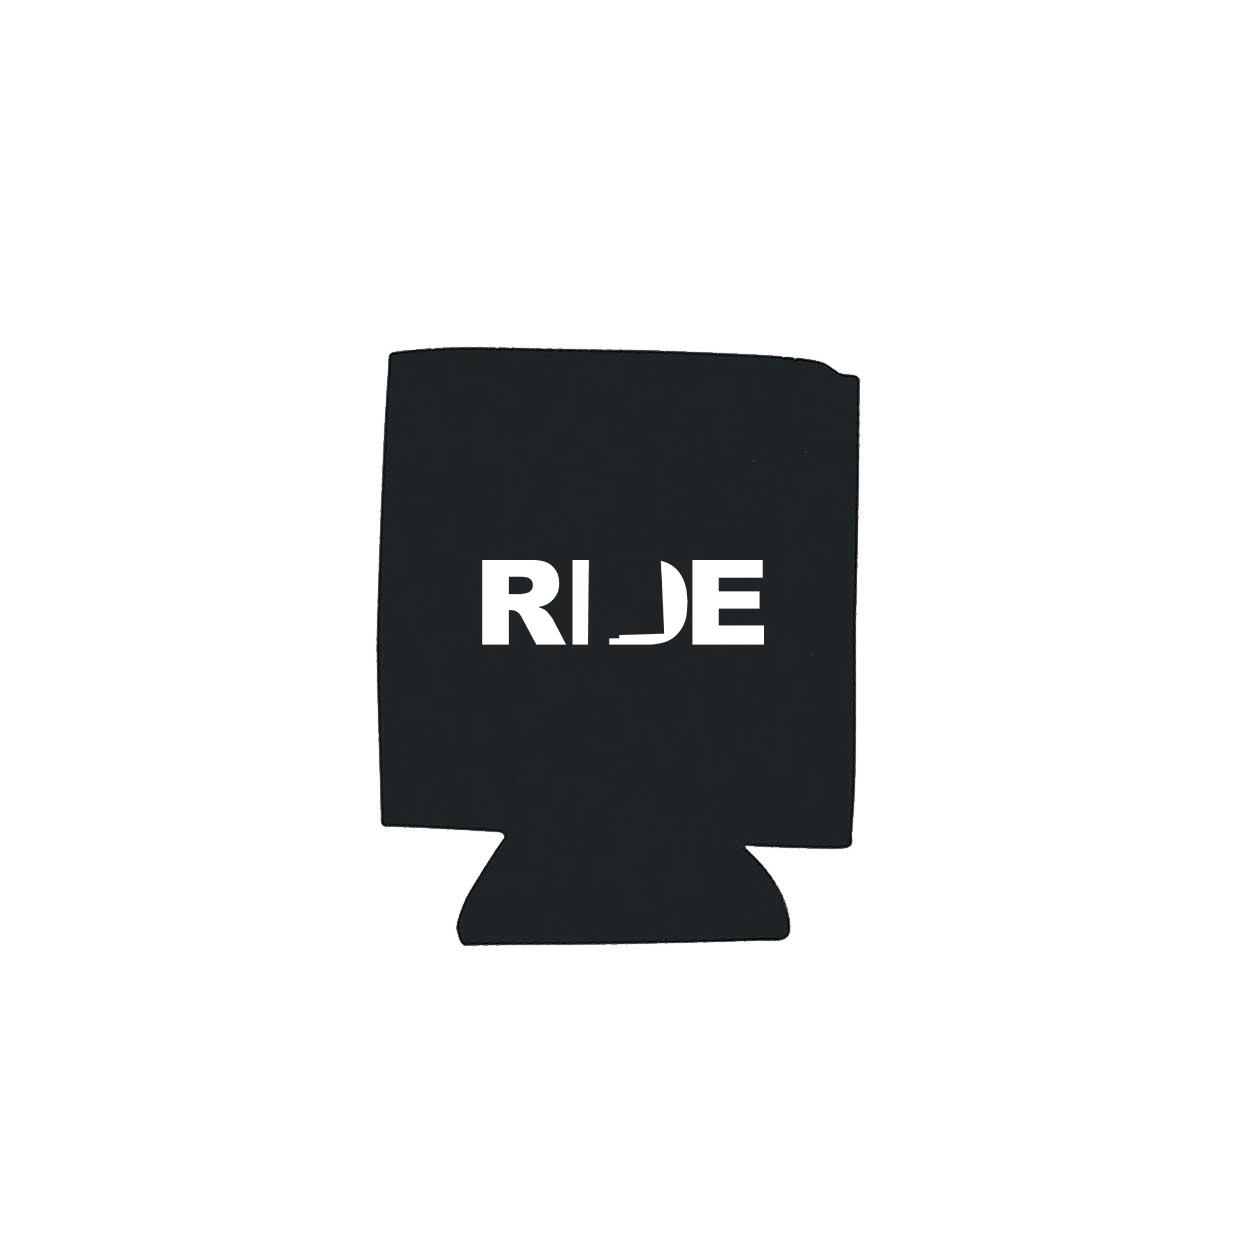 Ride New Mexico Koozie Black (White Logo)